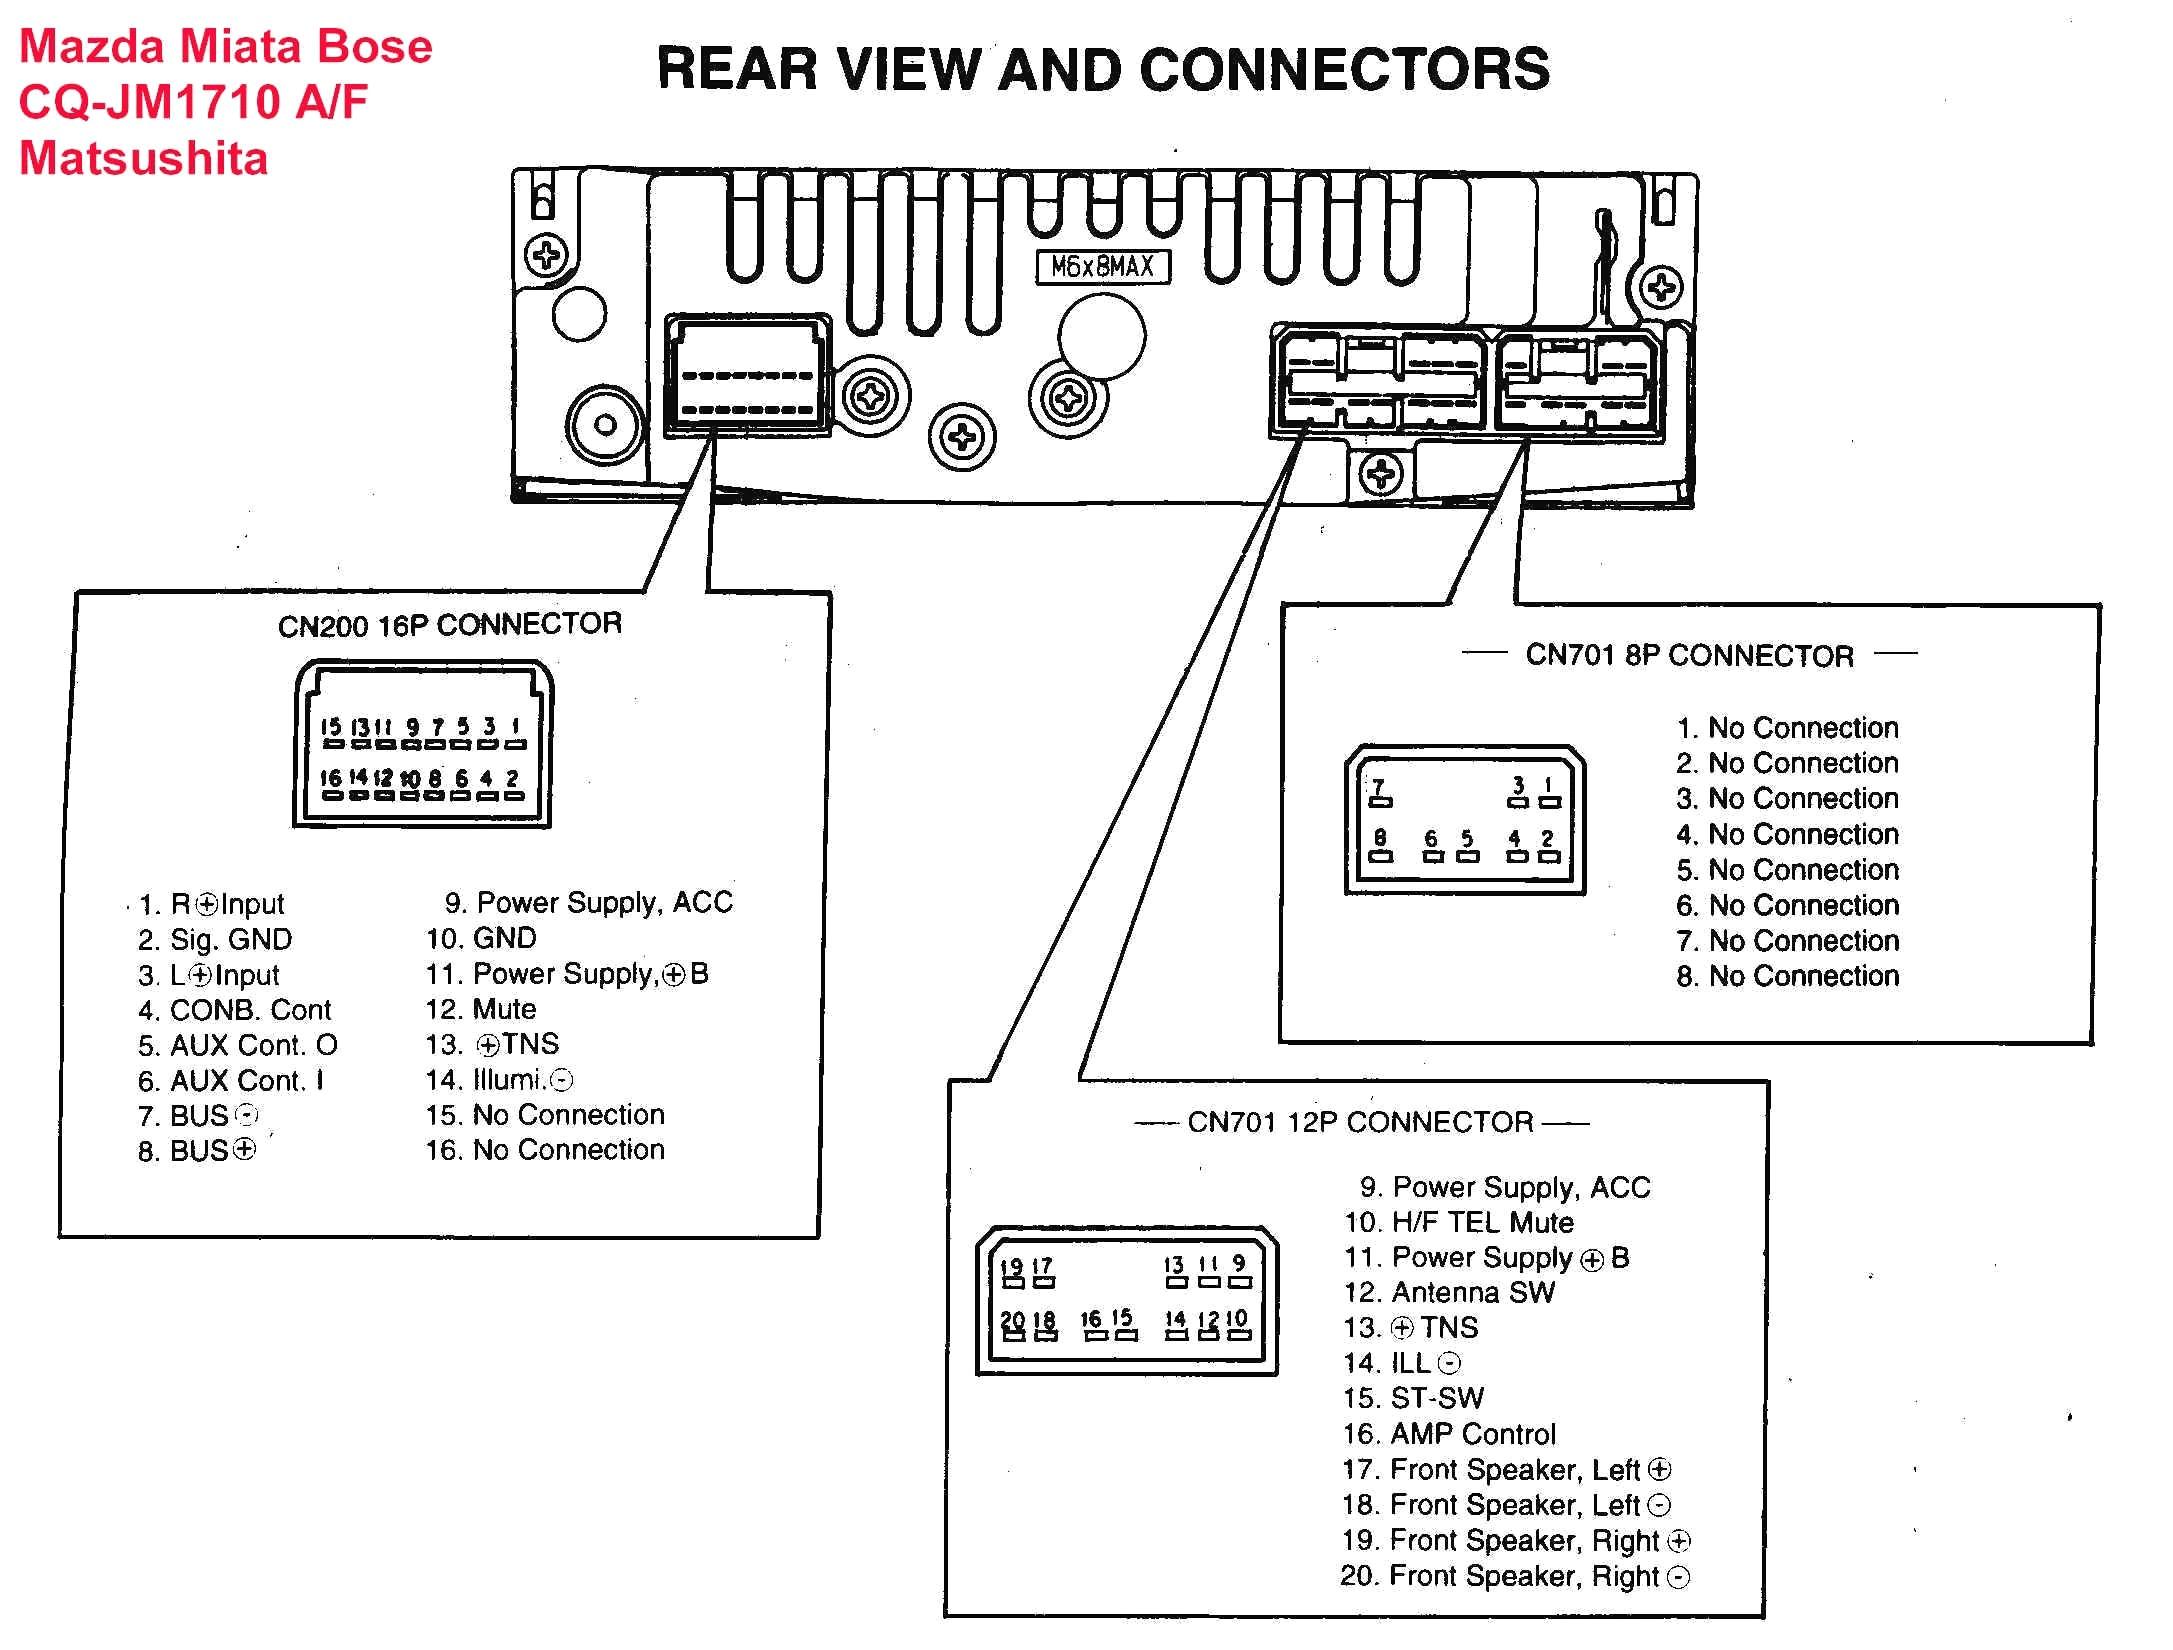 sony car radio wiring diagram panasonic car stereo wiring harness diagram archives elisaymk jpg